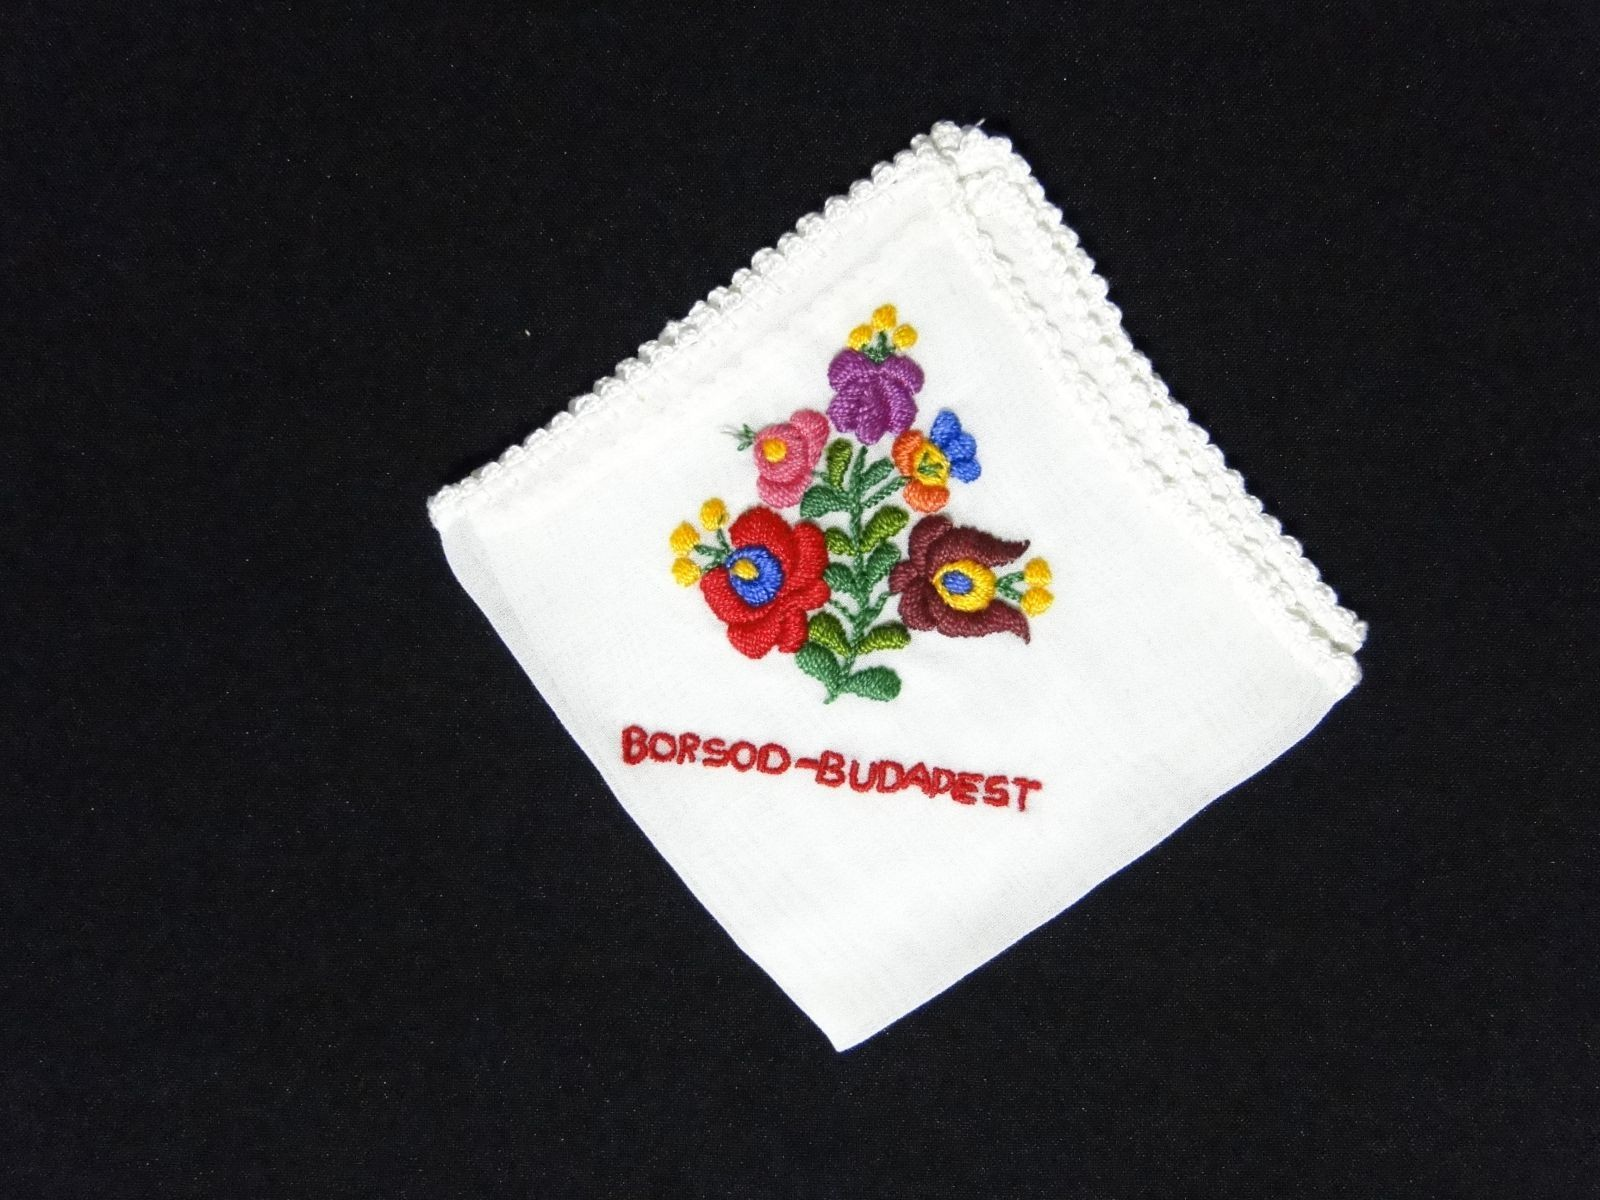 DSC09480.JPG (1600×1200)